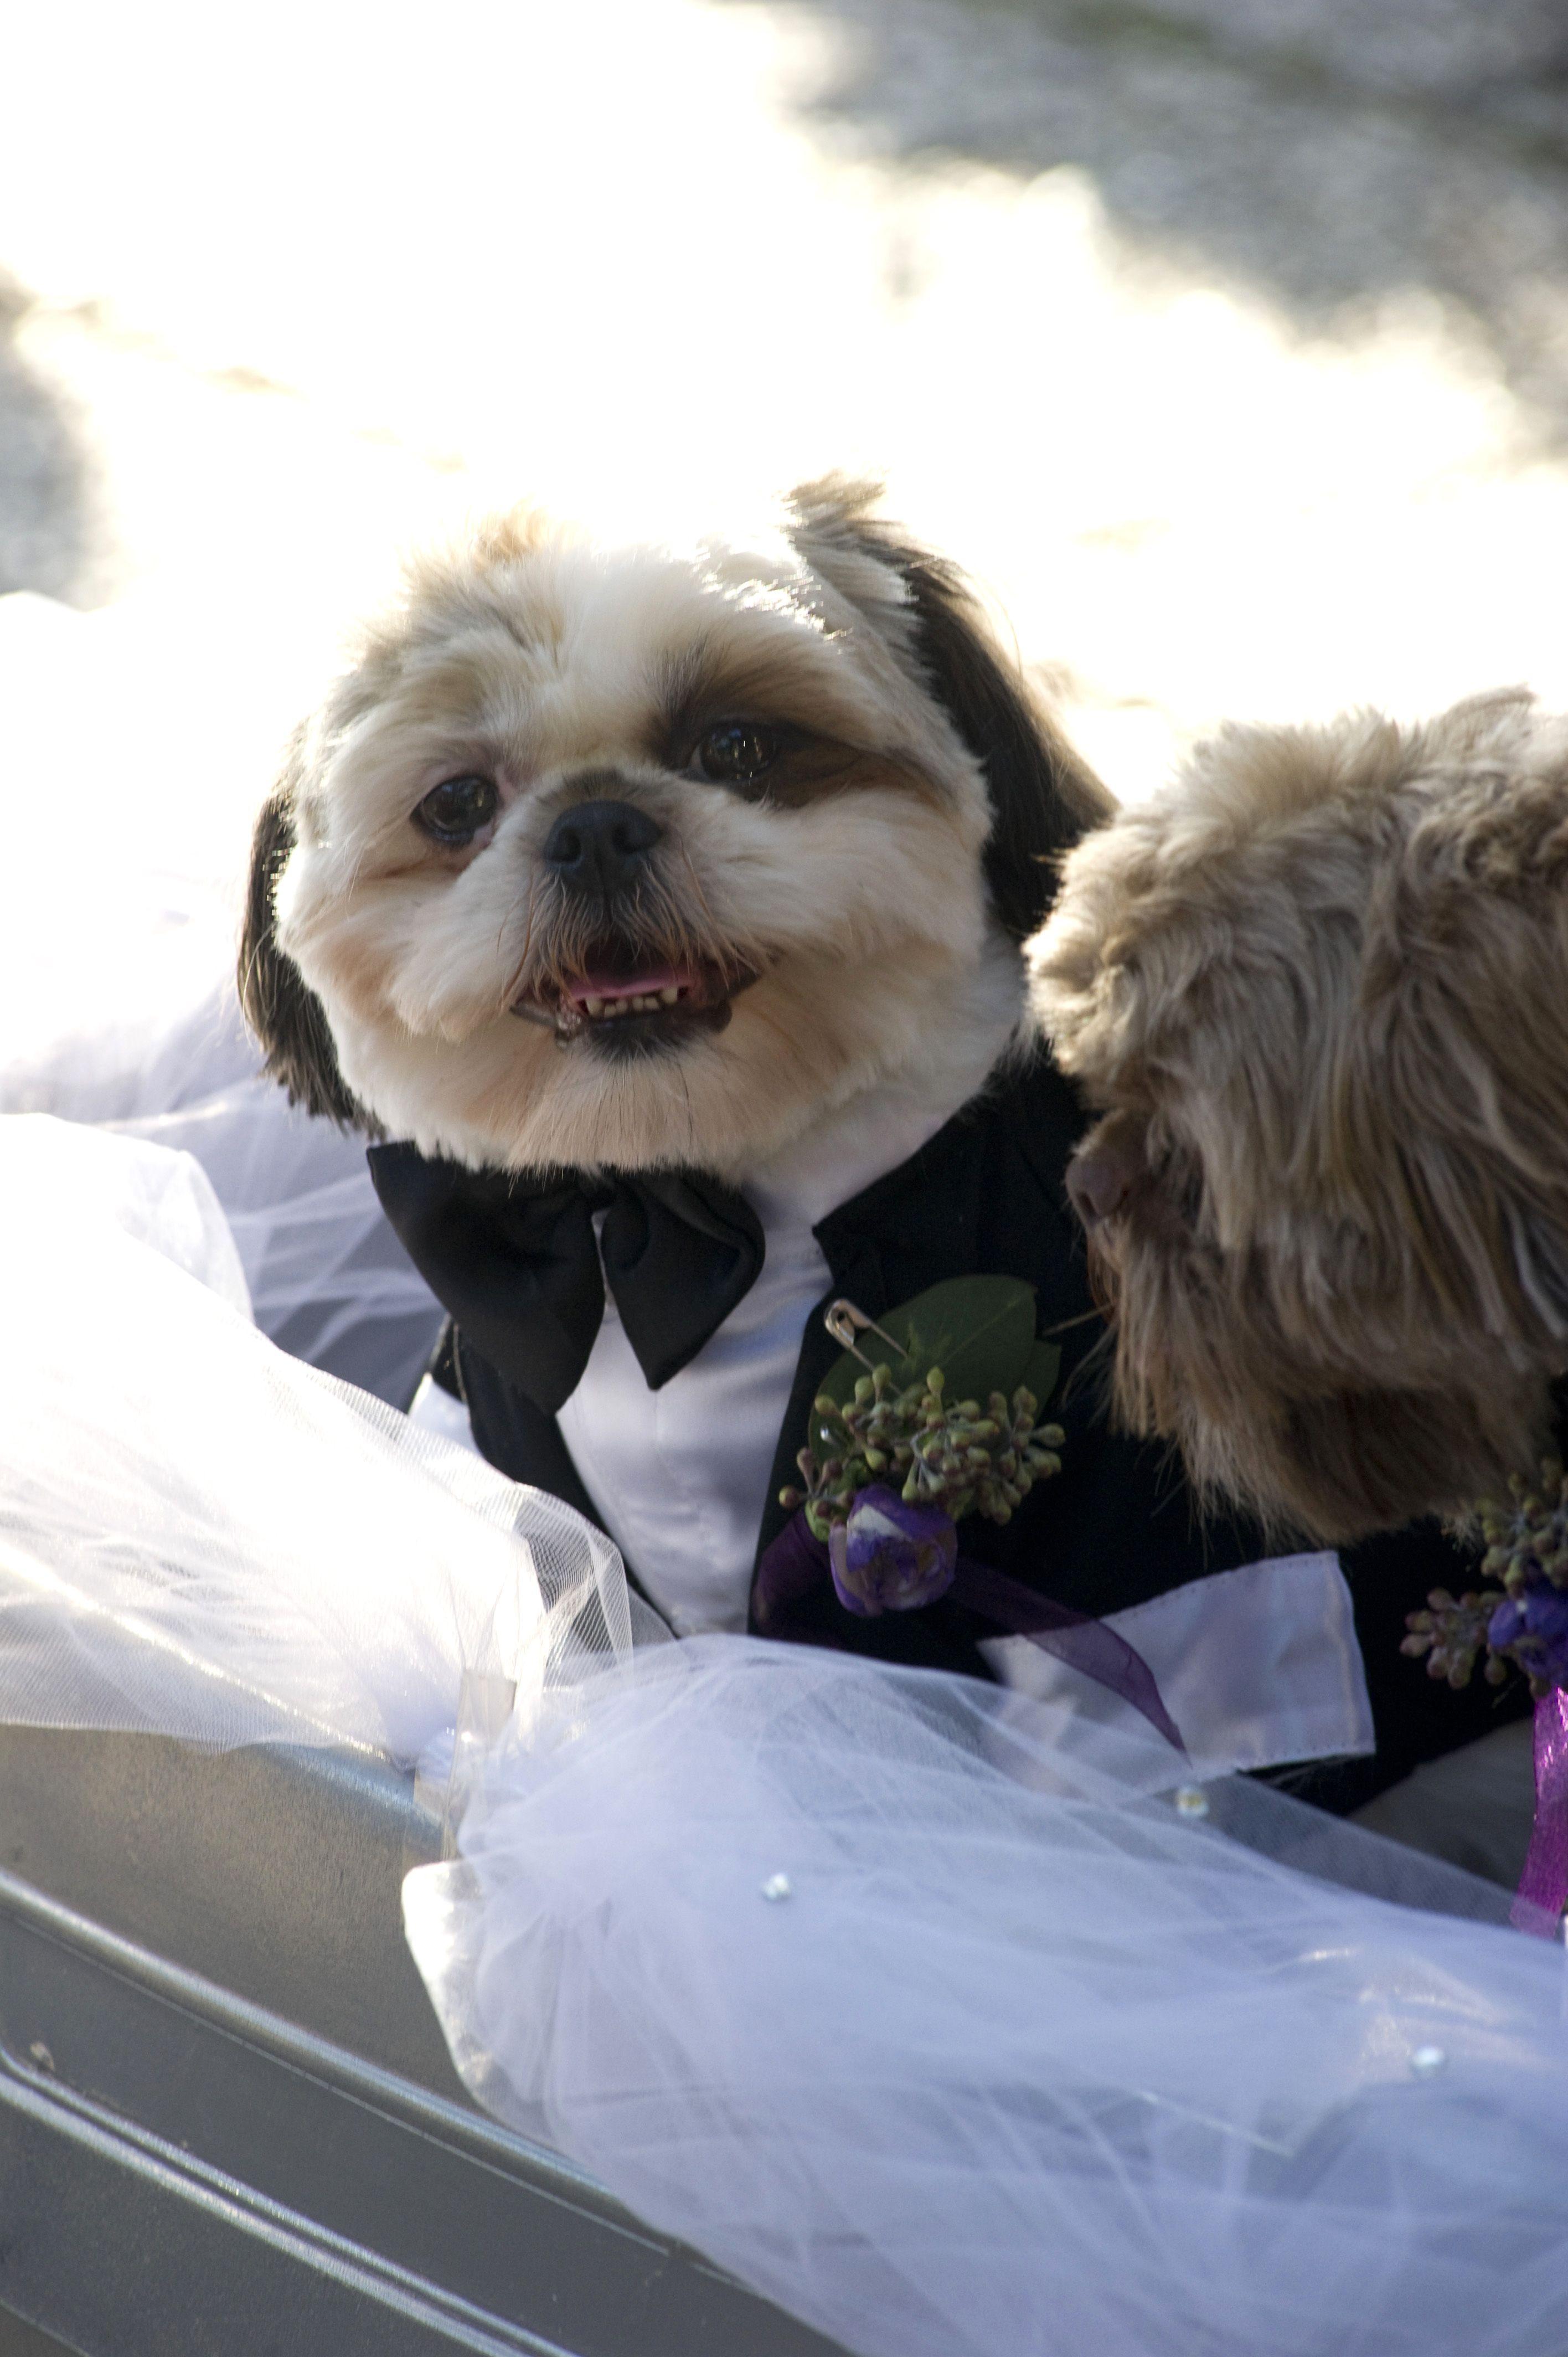 Dublin The Shih Tzu In His Wedding Attire Animals Shih Tzu